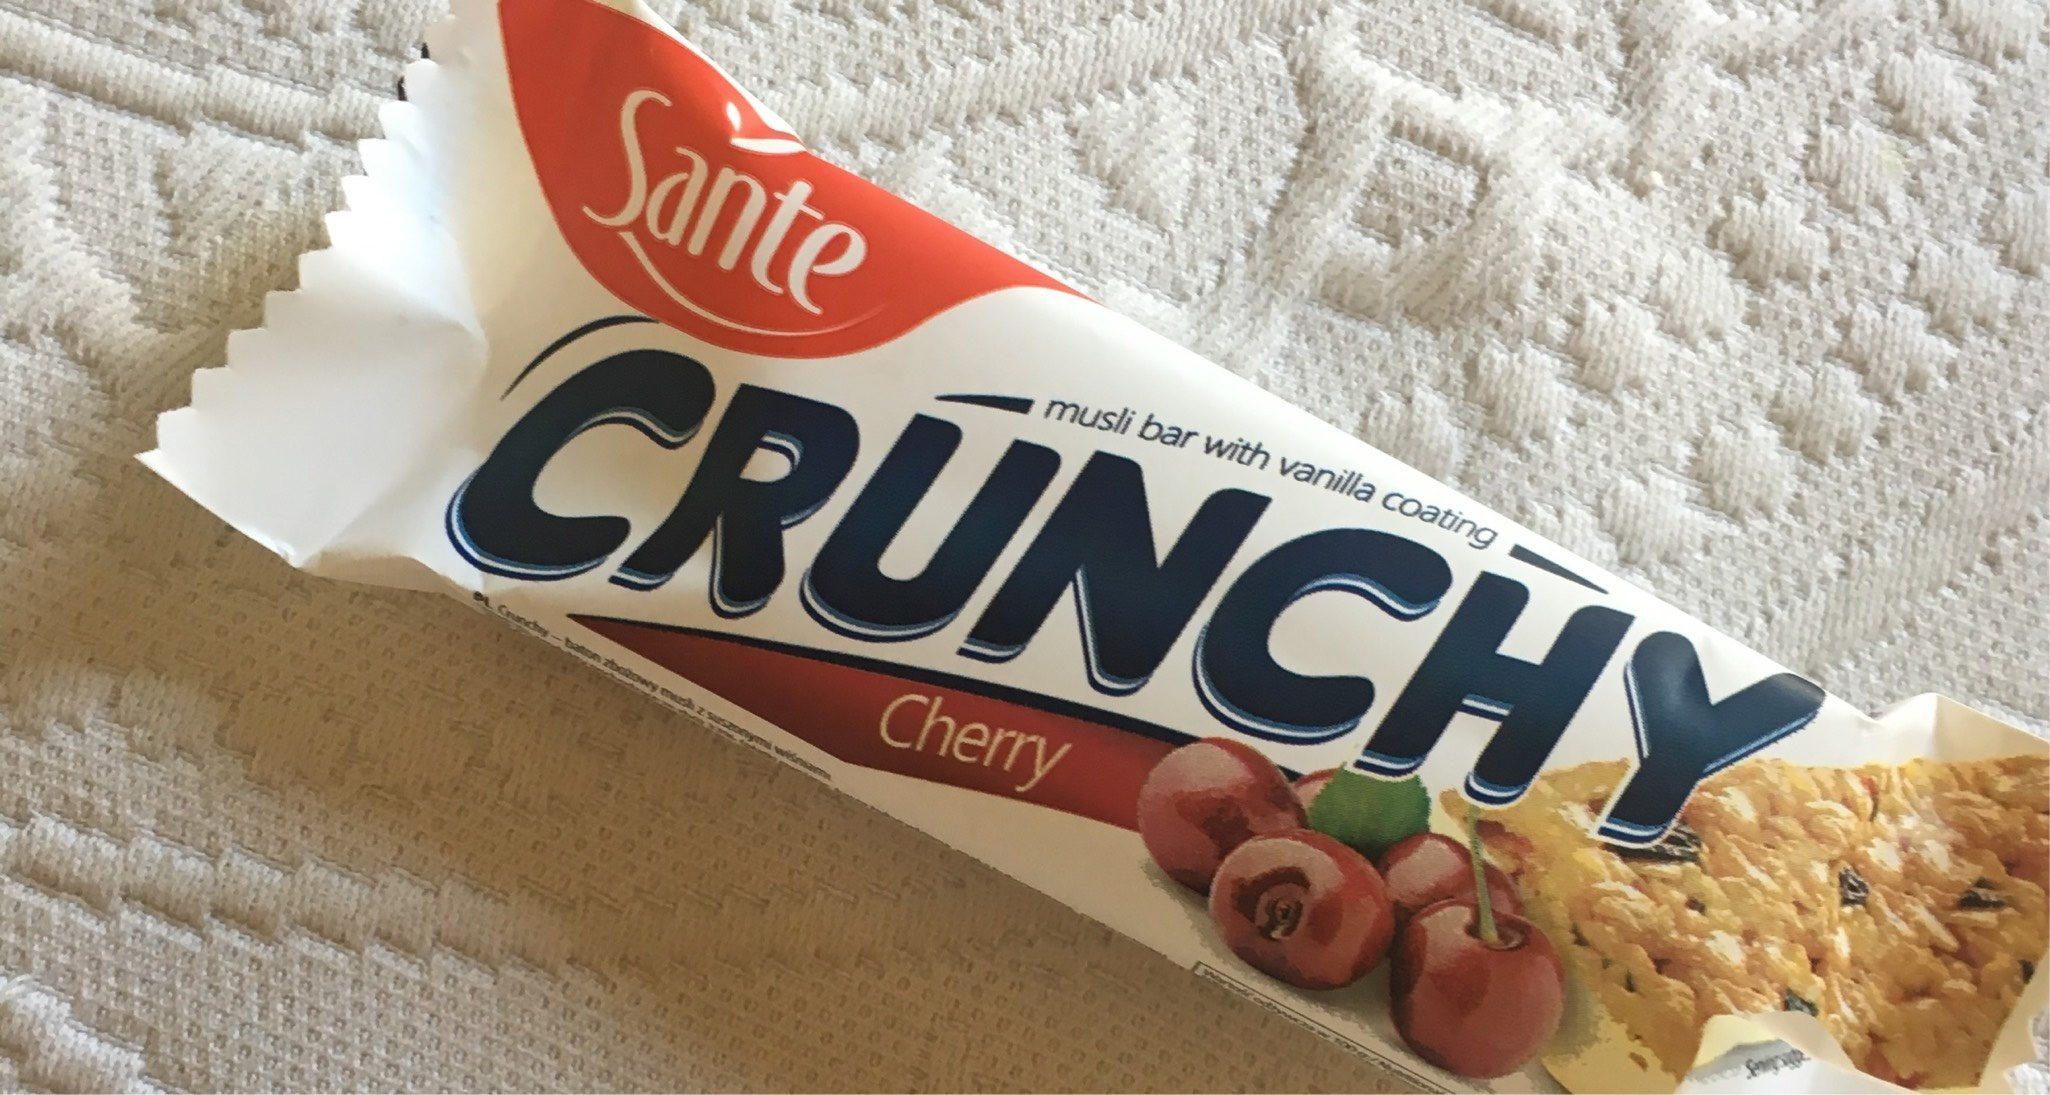 Crunchy cherry - Product